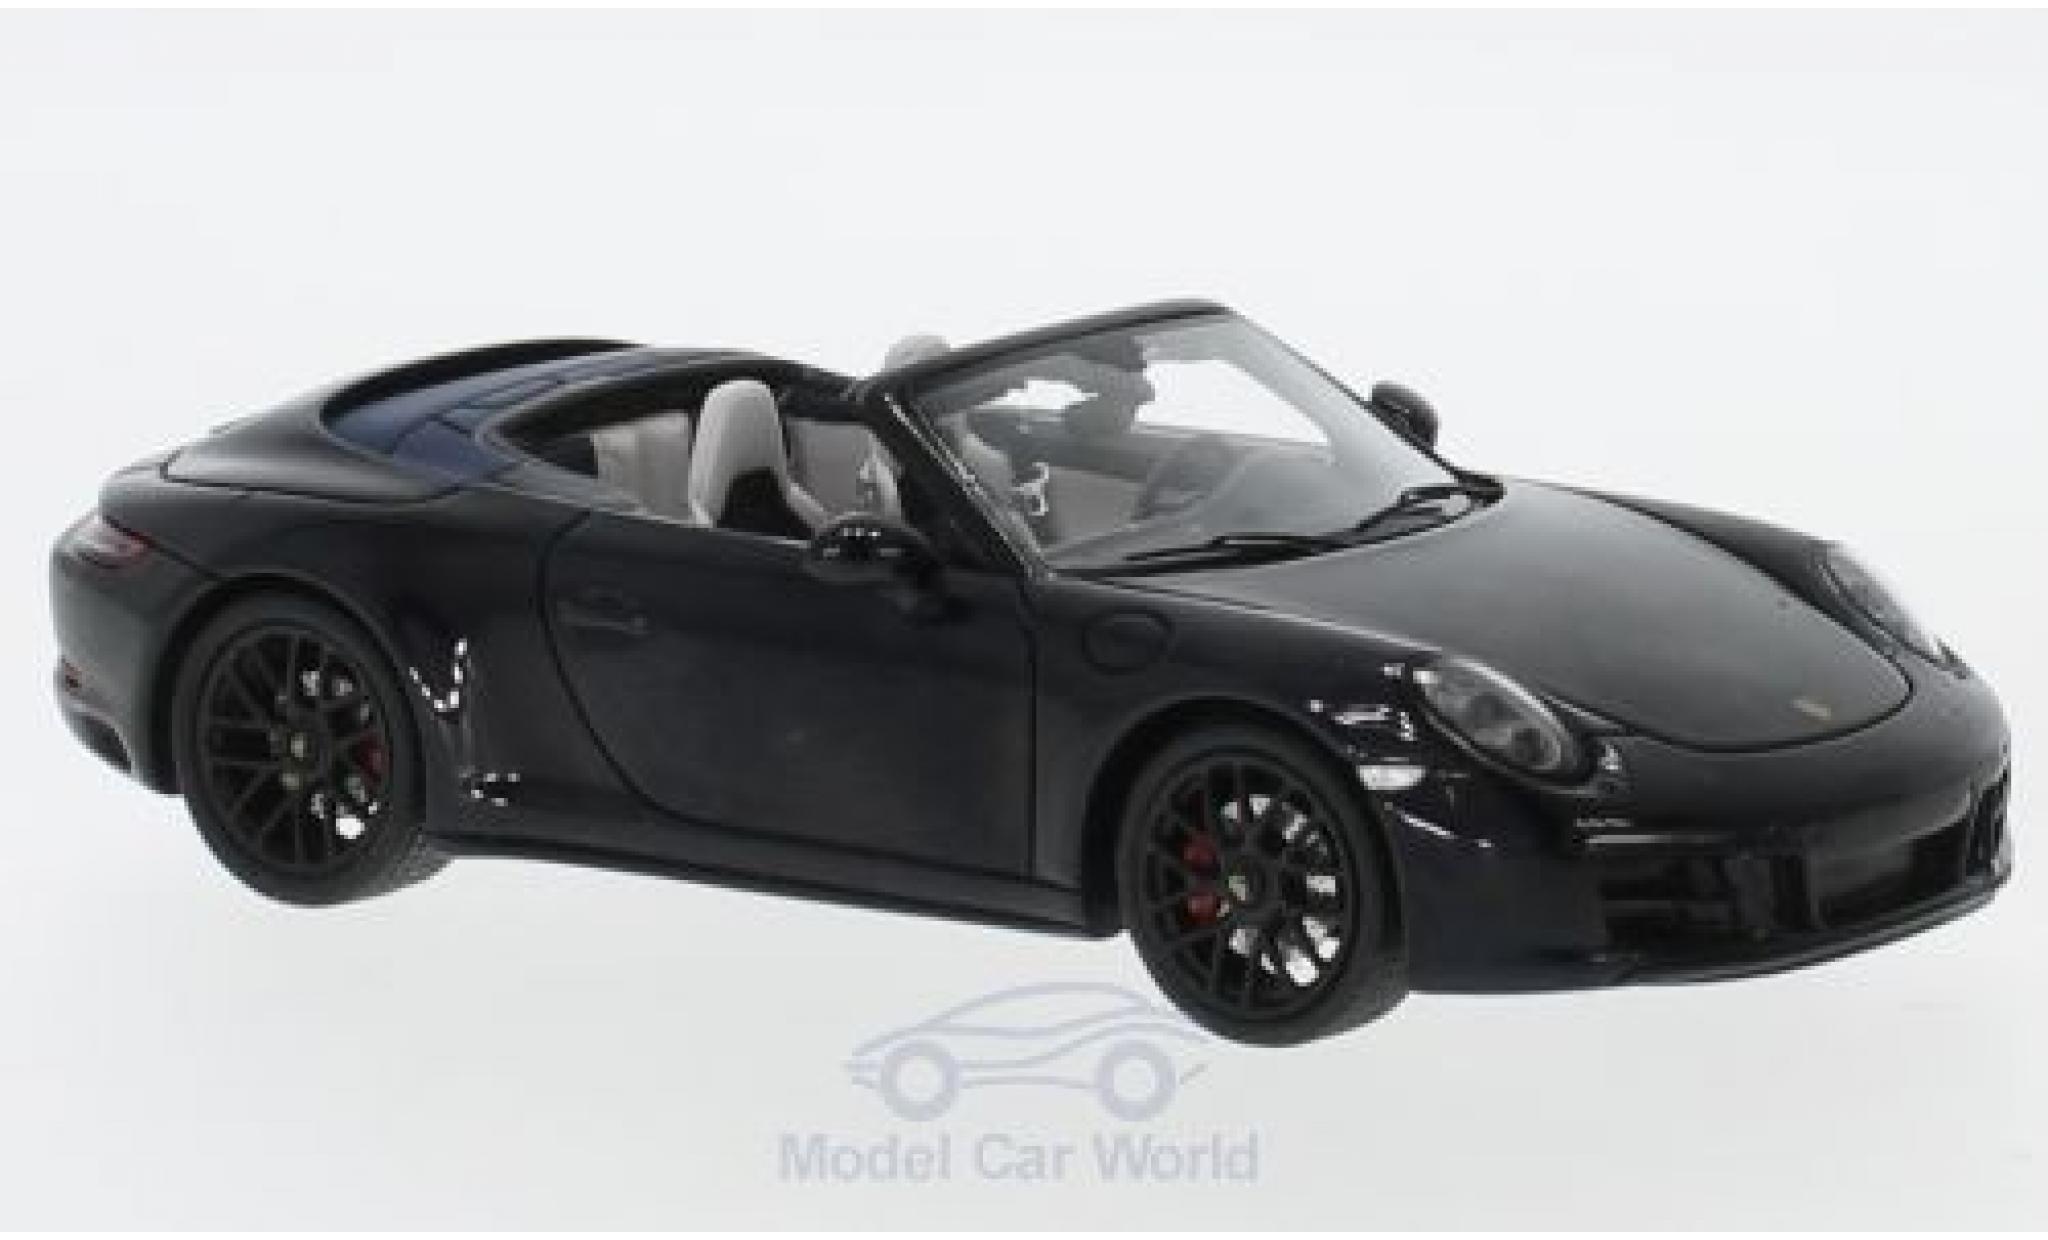 Porsche 991 GTS 1/43 Spark 911 Carrera Cabriolet black 2017